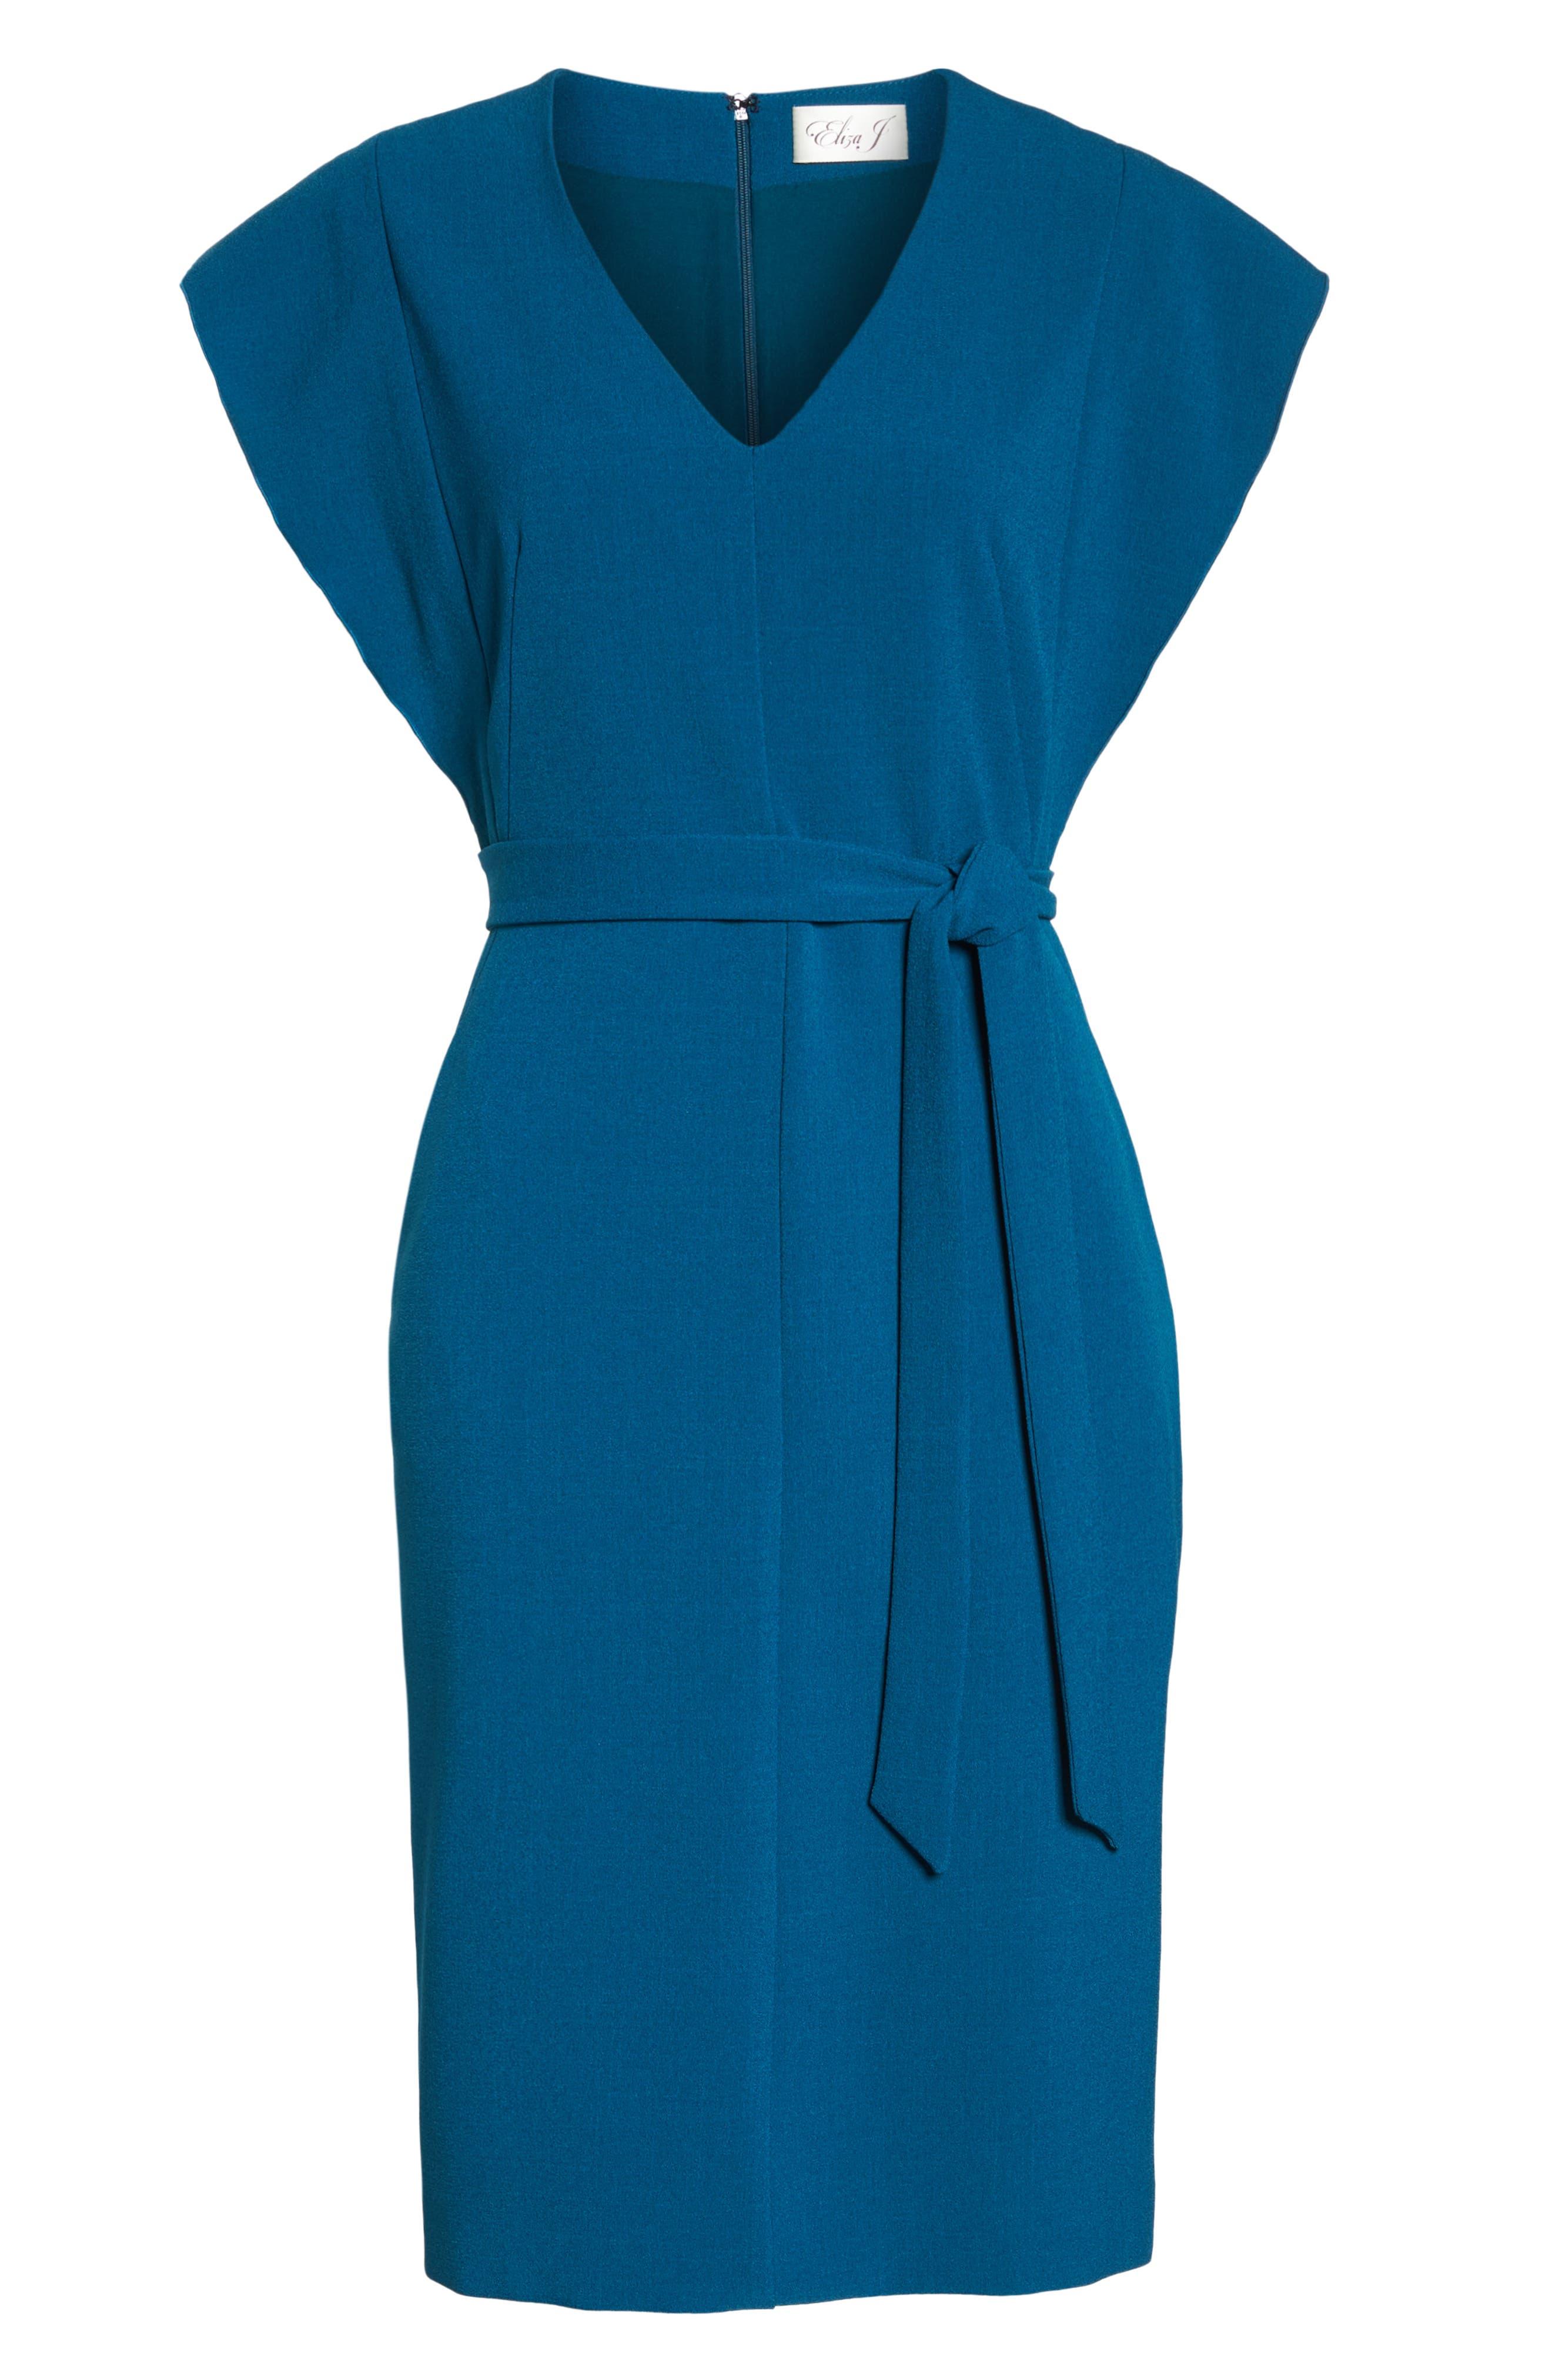 Ruffle Sleeve Sheath Dress,                             Alternate thumbnail 7, color,                             TEAL